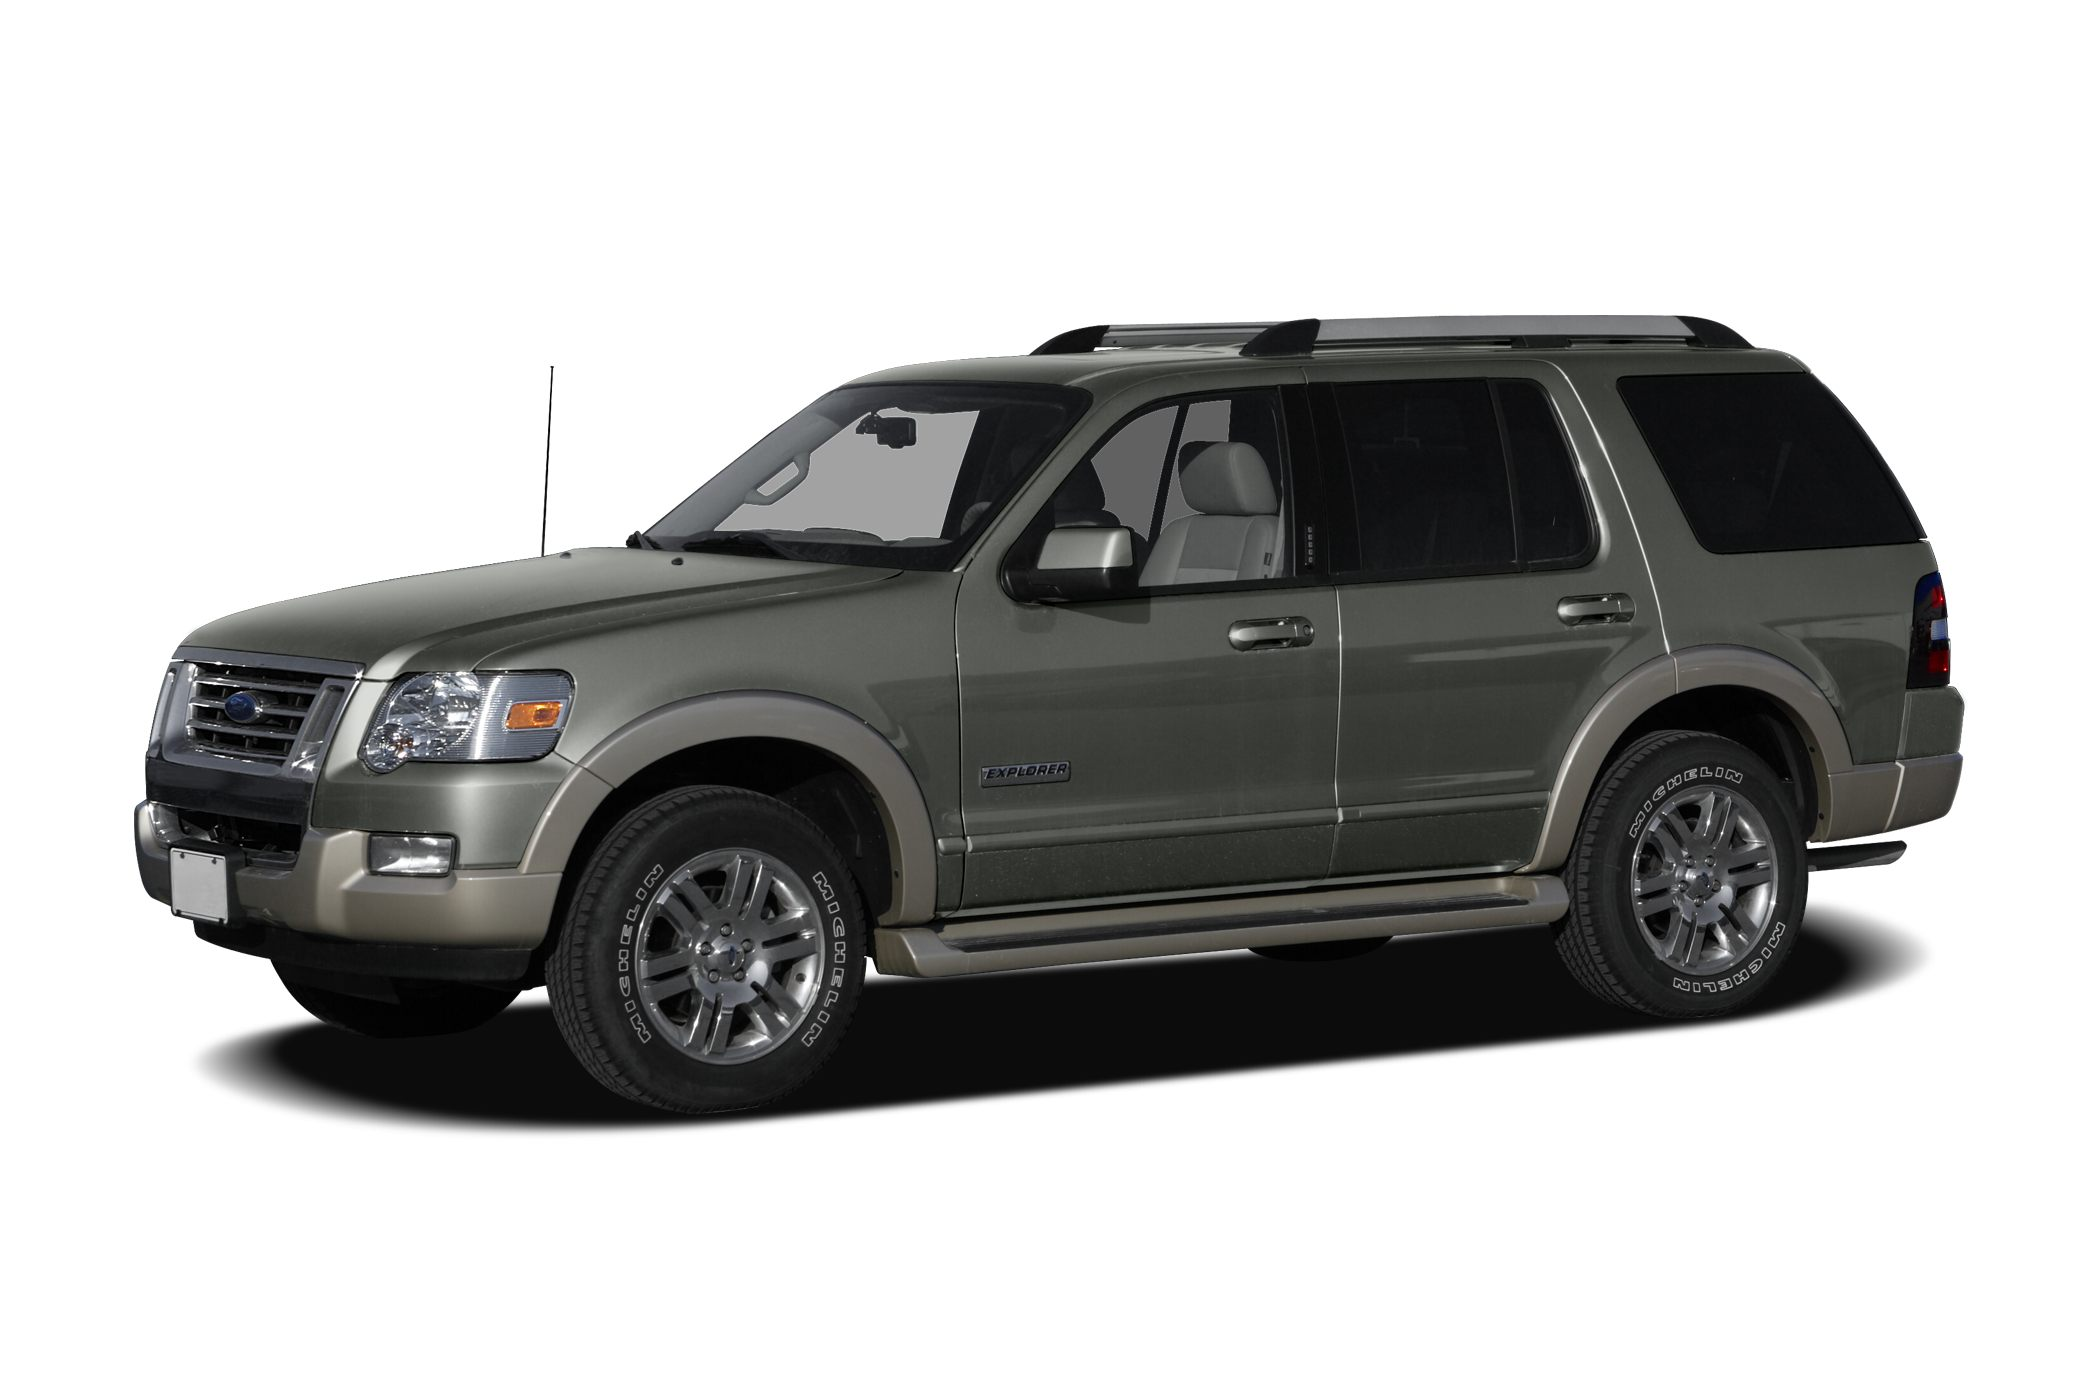 2007 Ford Explorer Eddie Bauer Miles 75198Stock 74197624 VIN 1FMEU64E274A97624